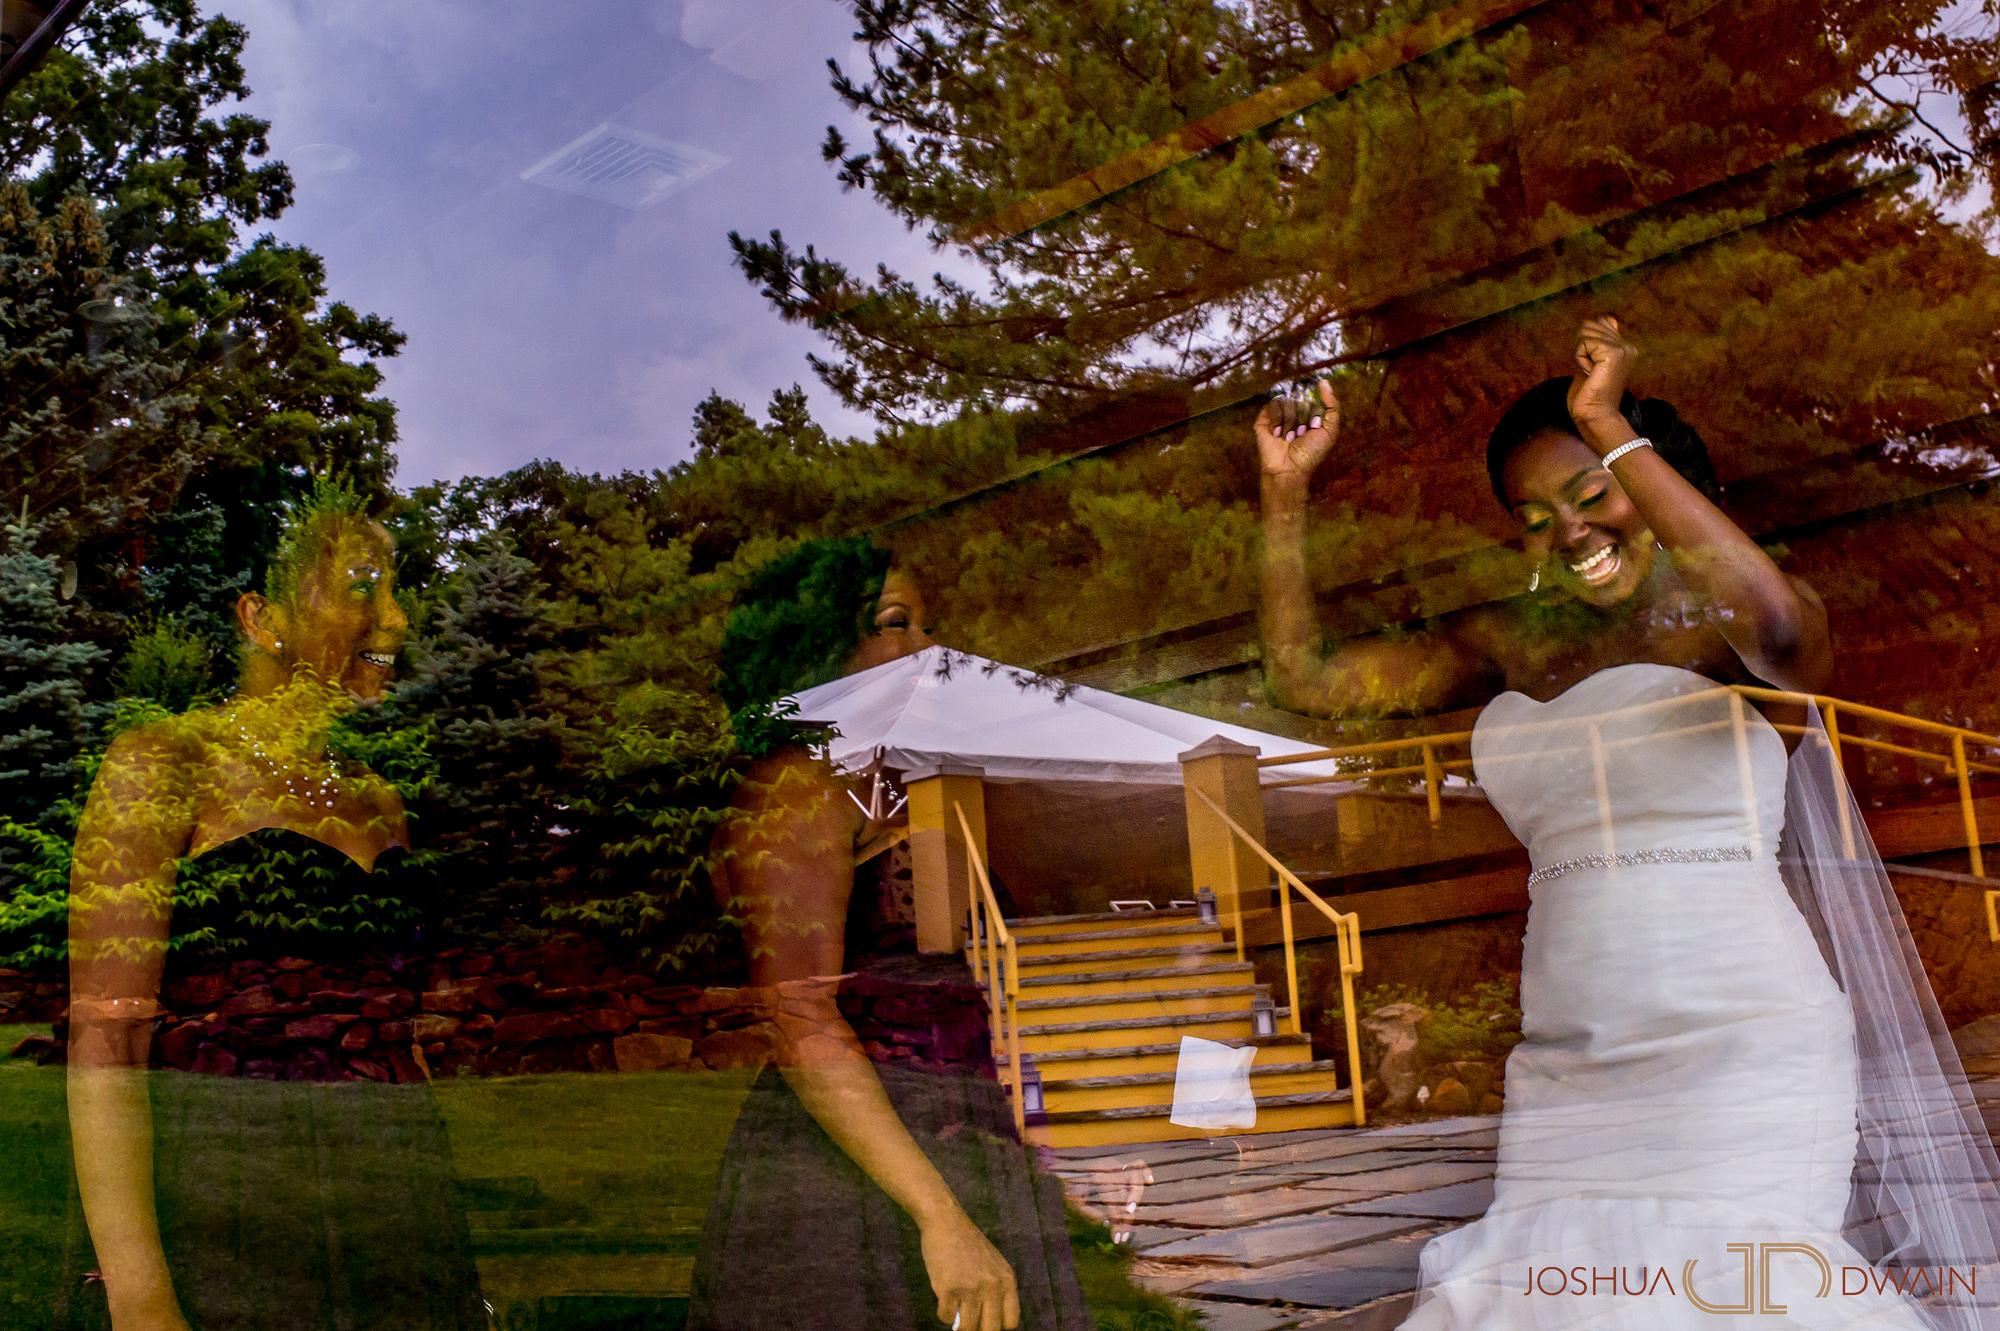 anna-edwin-014-stone-house-warren-new-jersey-wedding-photographer-joshua-dwain